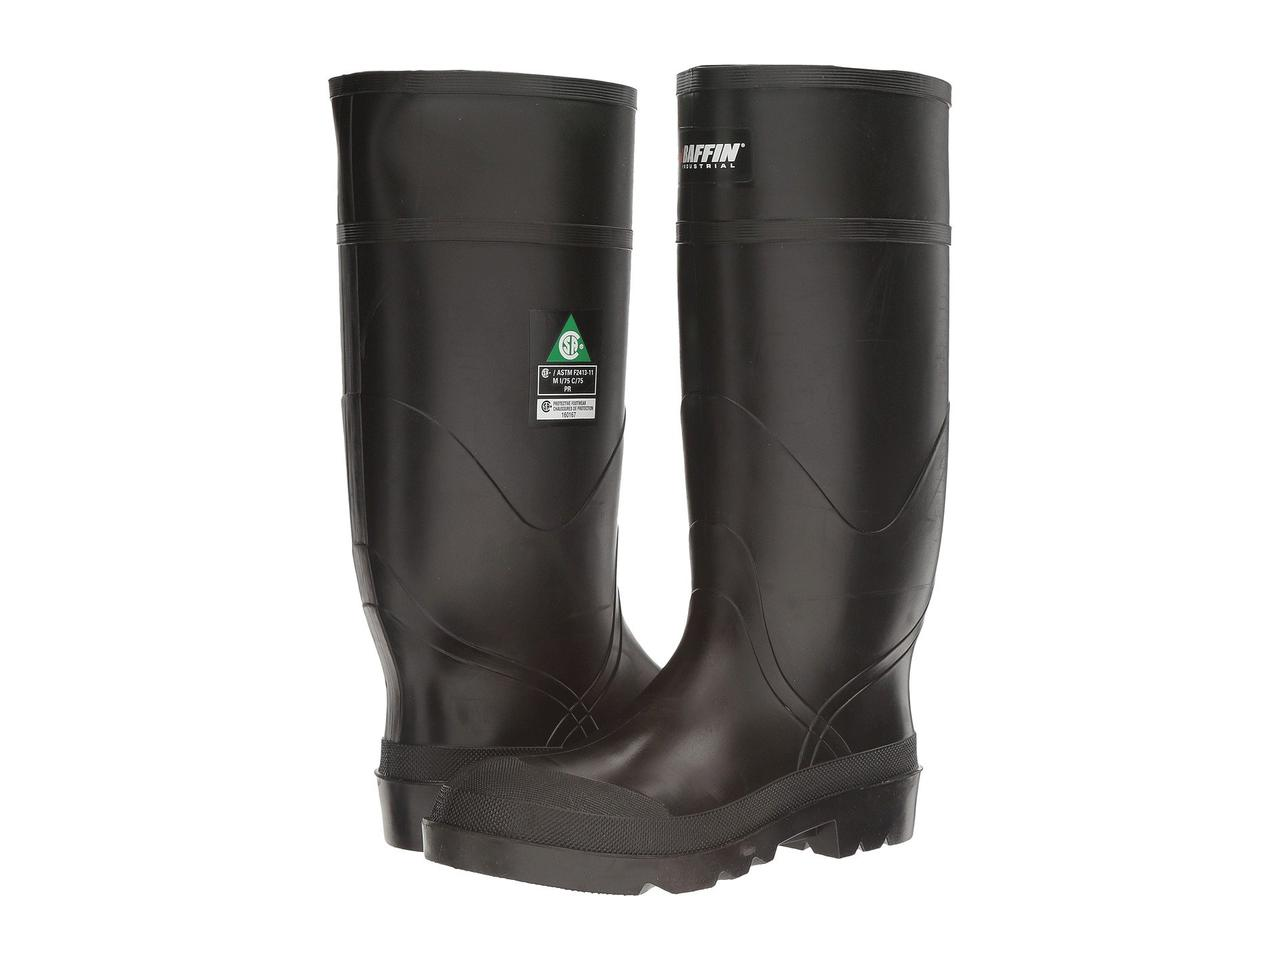 Ботинки/Сапоги (Оригинал) Baffin Express Steel Toe/Steel Plate Boot Black